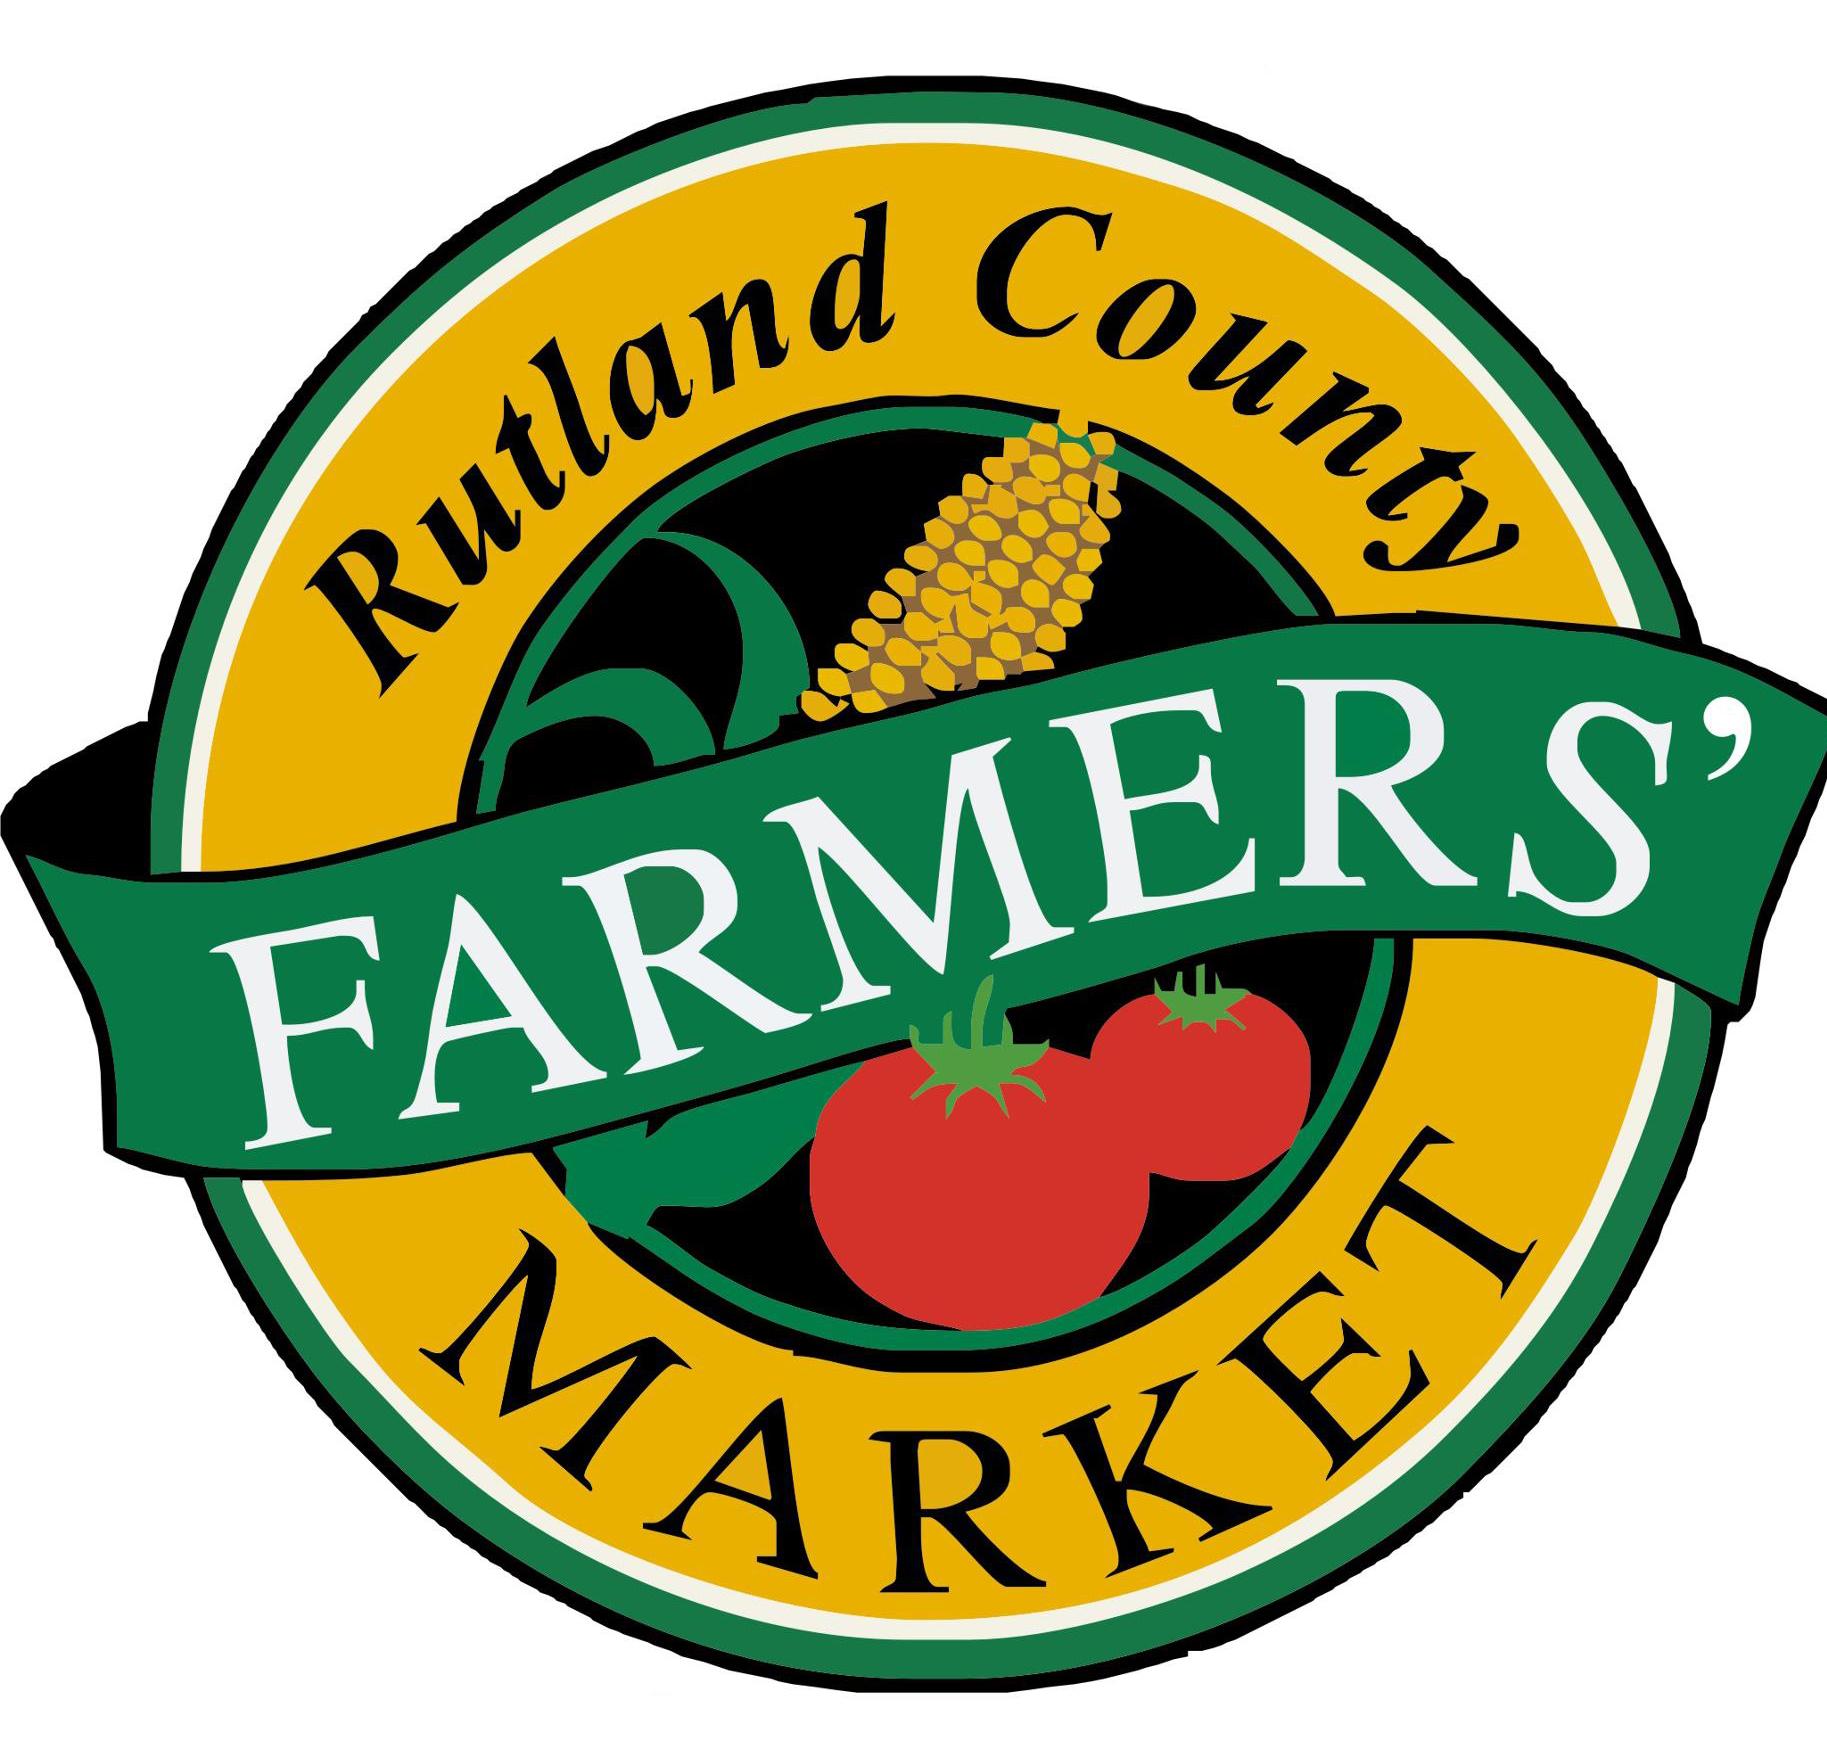 Rutland County Farmers Market Logo.png